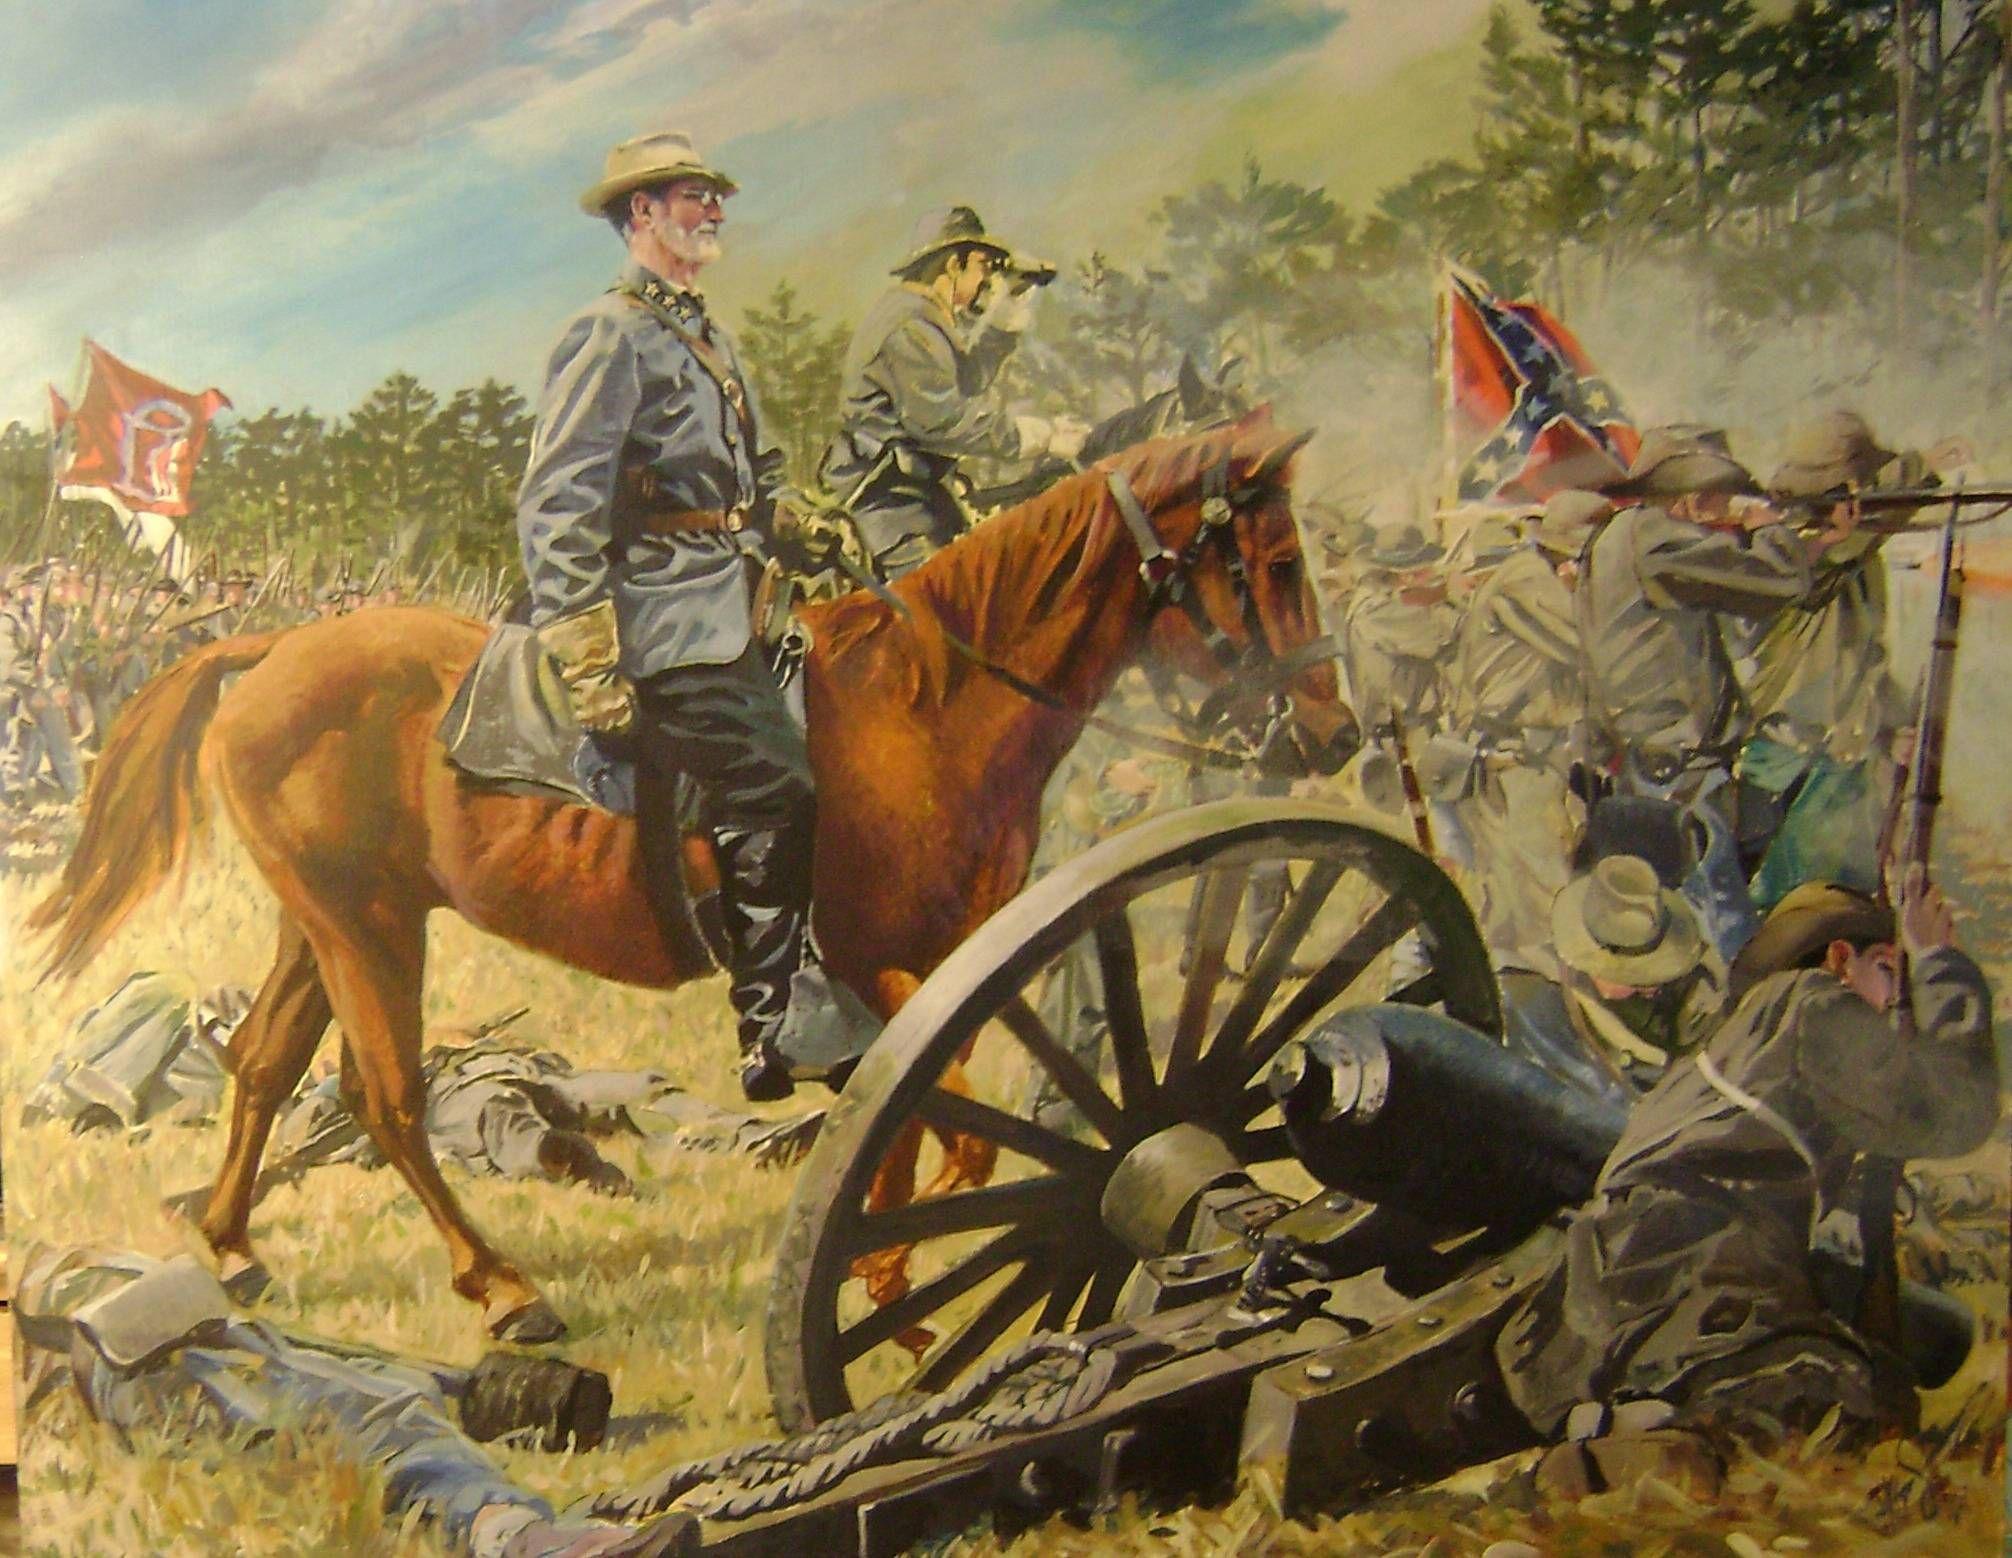 Confederate Soldiers In The American Civil War Art Print ... |American Civil War Battle Paintings